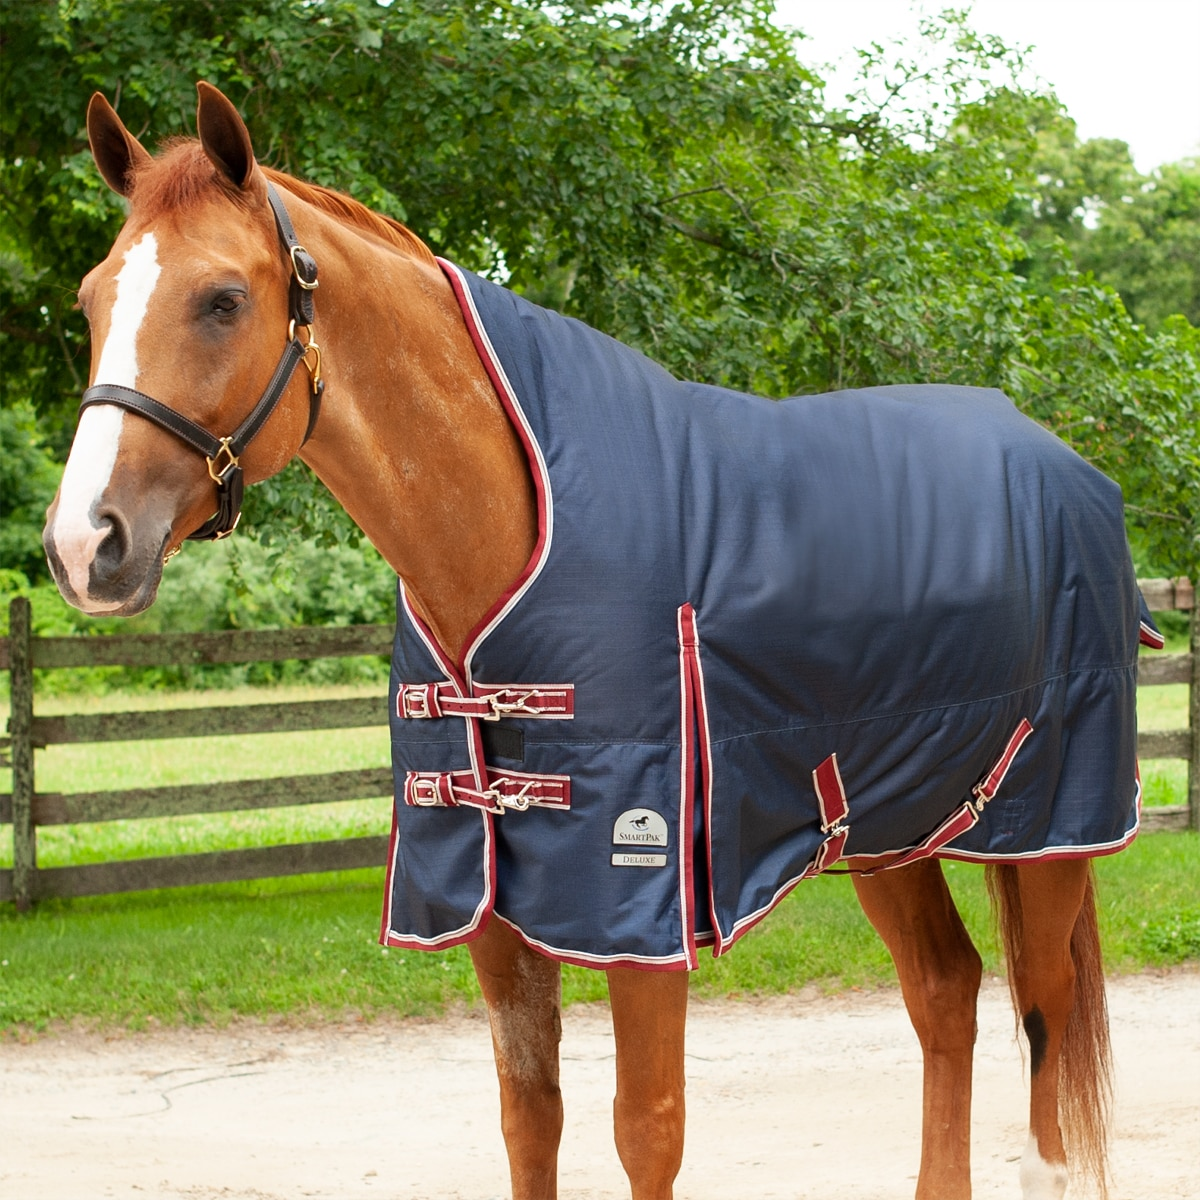 High Neck Thermal Blanket Size 155cm 100g 1200d Horse Blanket Winter Blanket outdoordecke